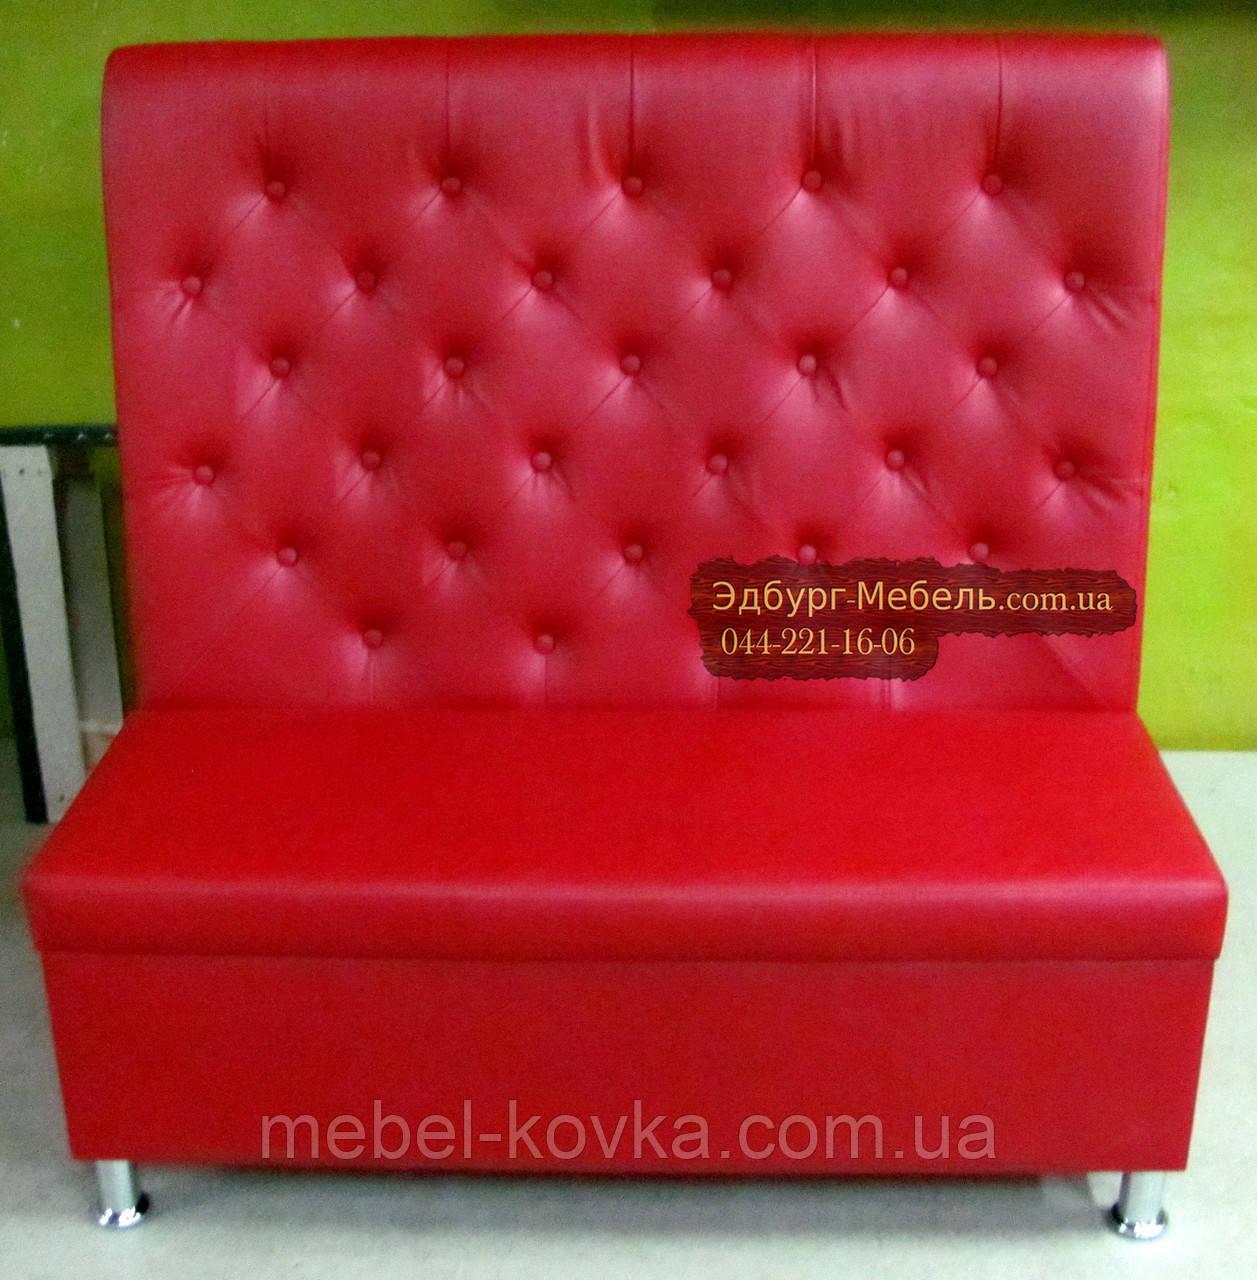 Високий диван для кафе Ренесанс 110см спинка